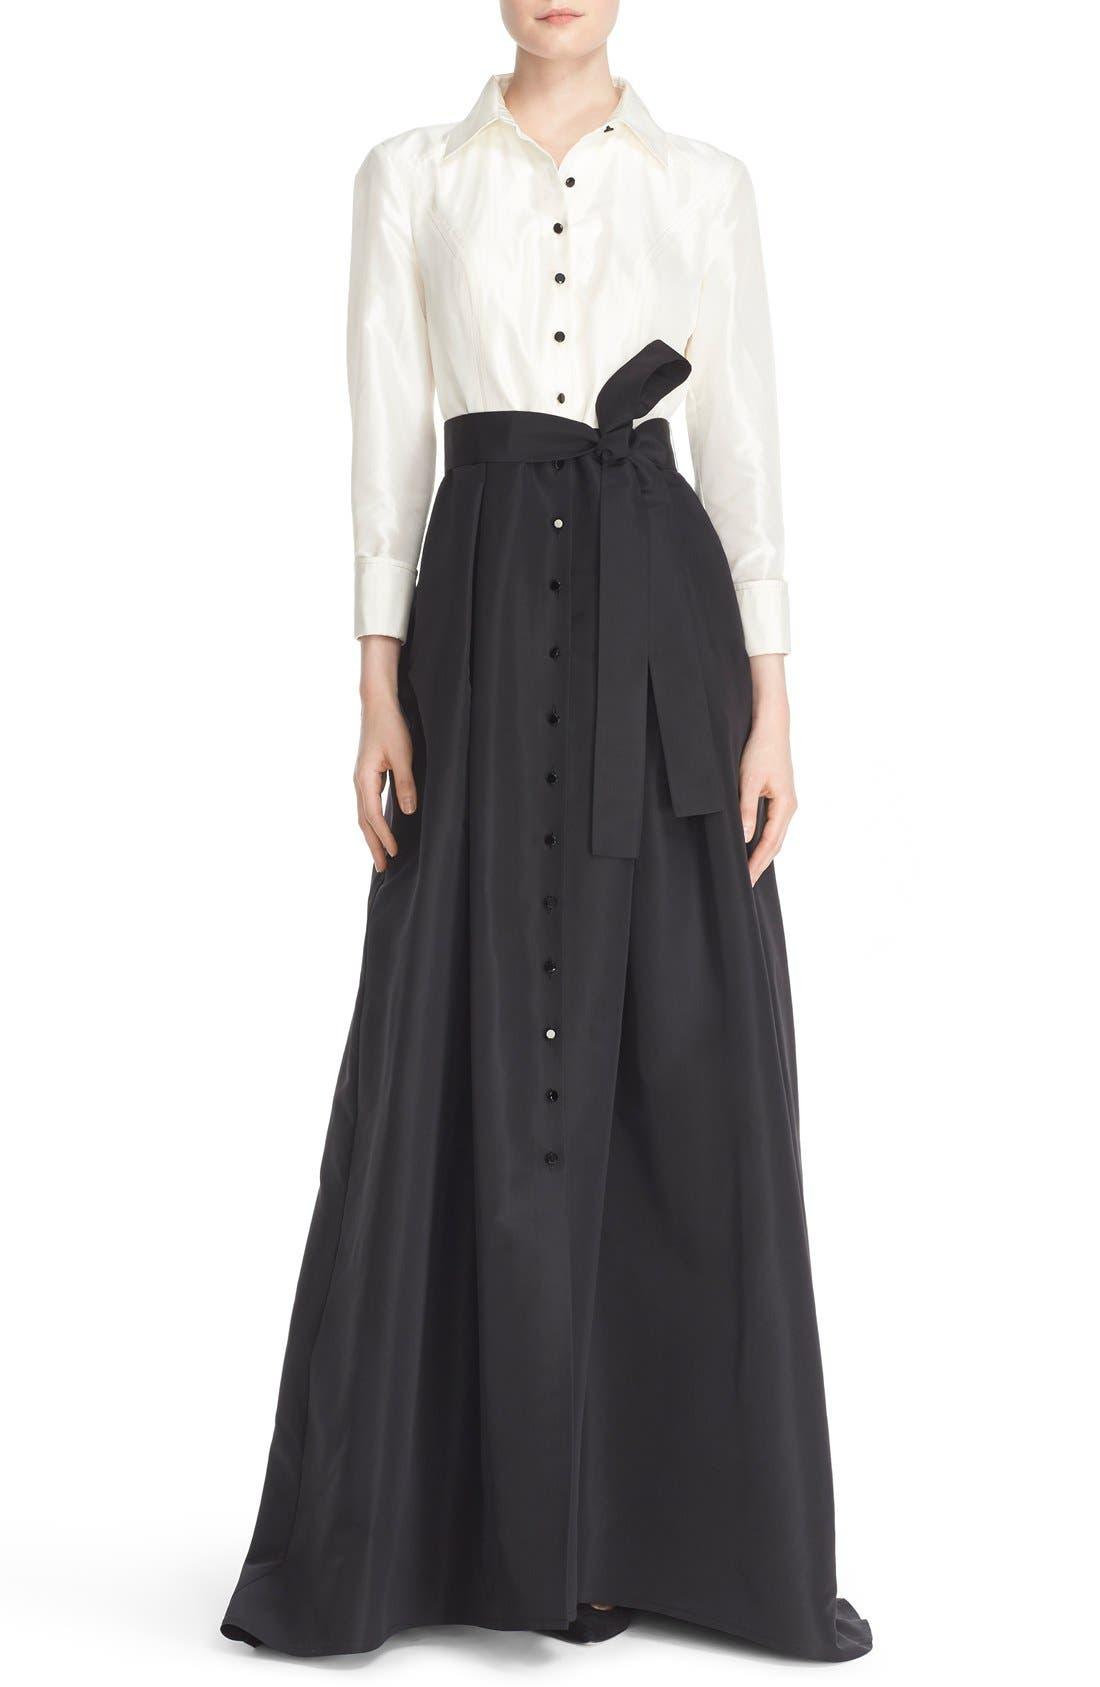 Carolina Herrera Silk Taffeta Trench Gown